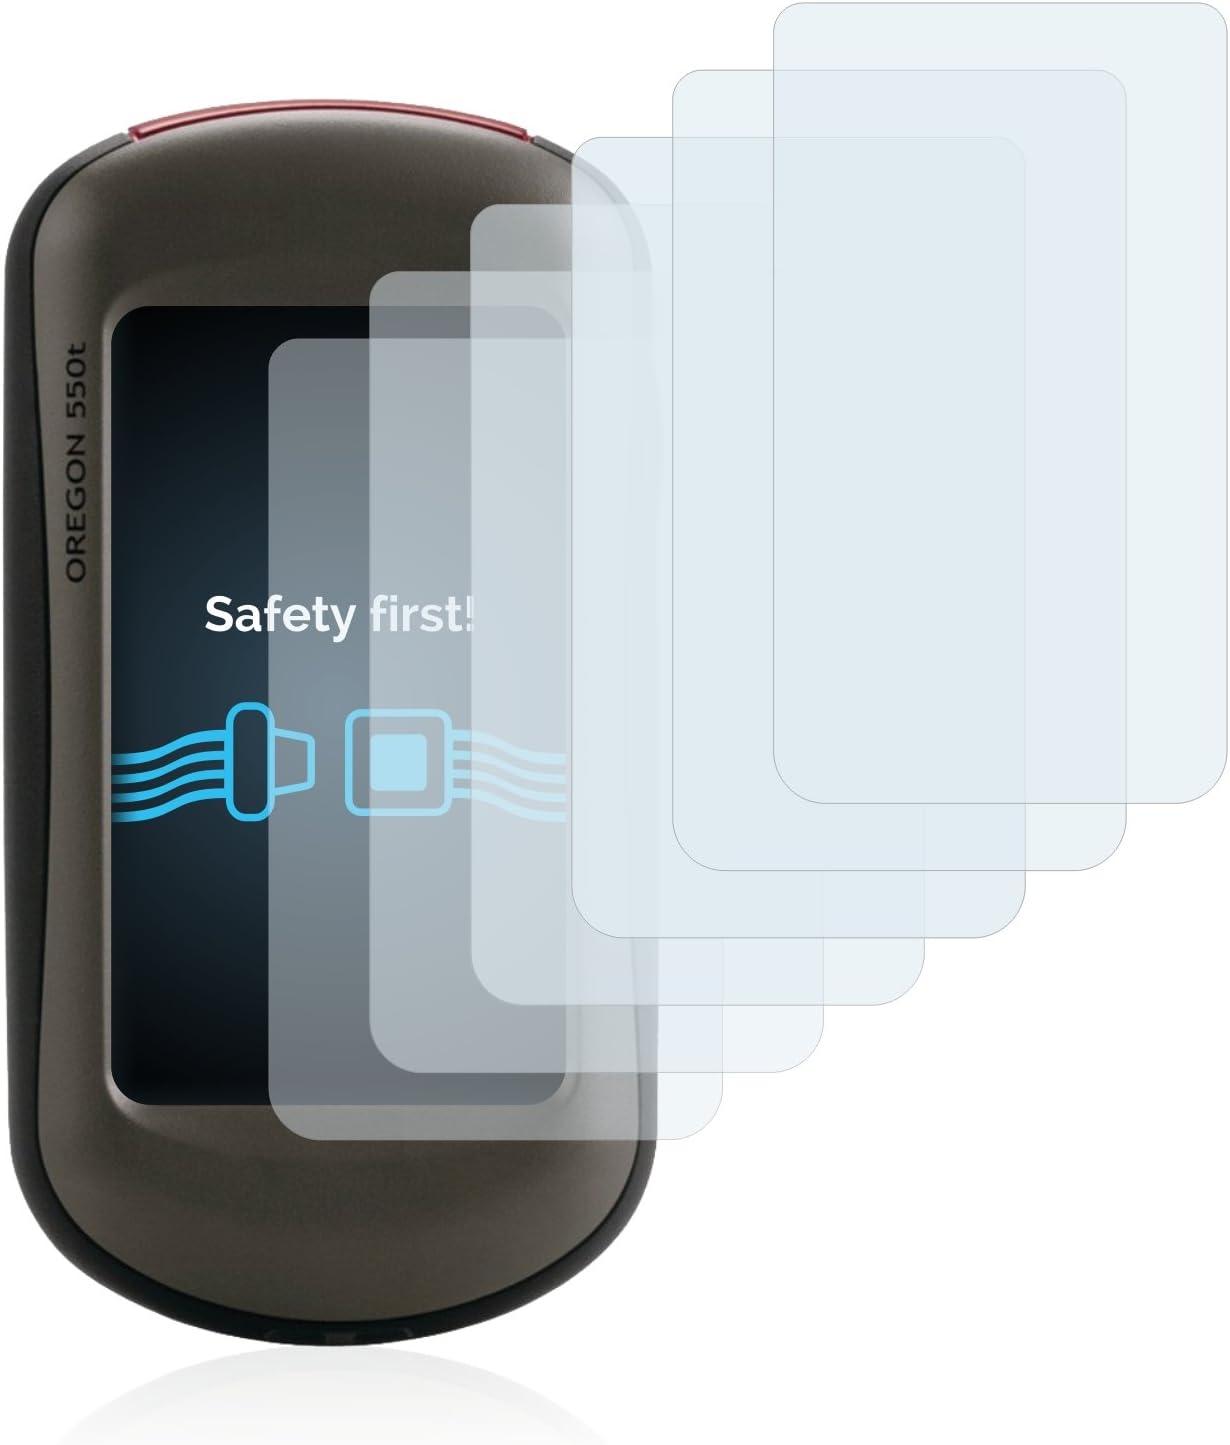 Pelicula Ultra Transparente 6 Unidades savvies Protector Pantalla Compatible con Tomtom GO 6250